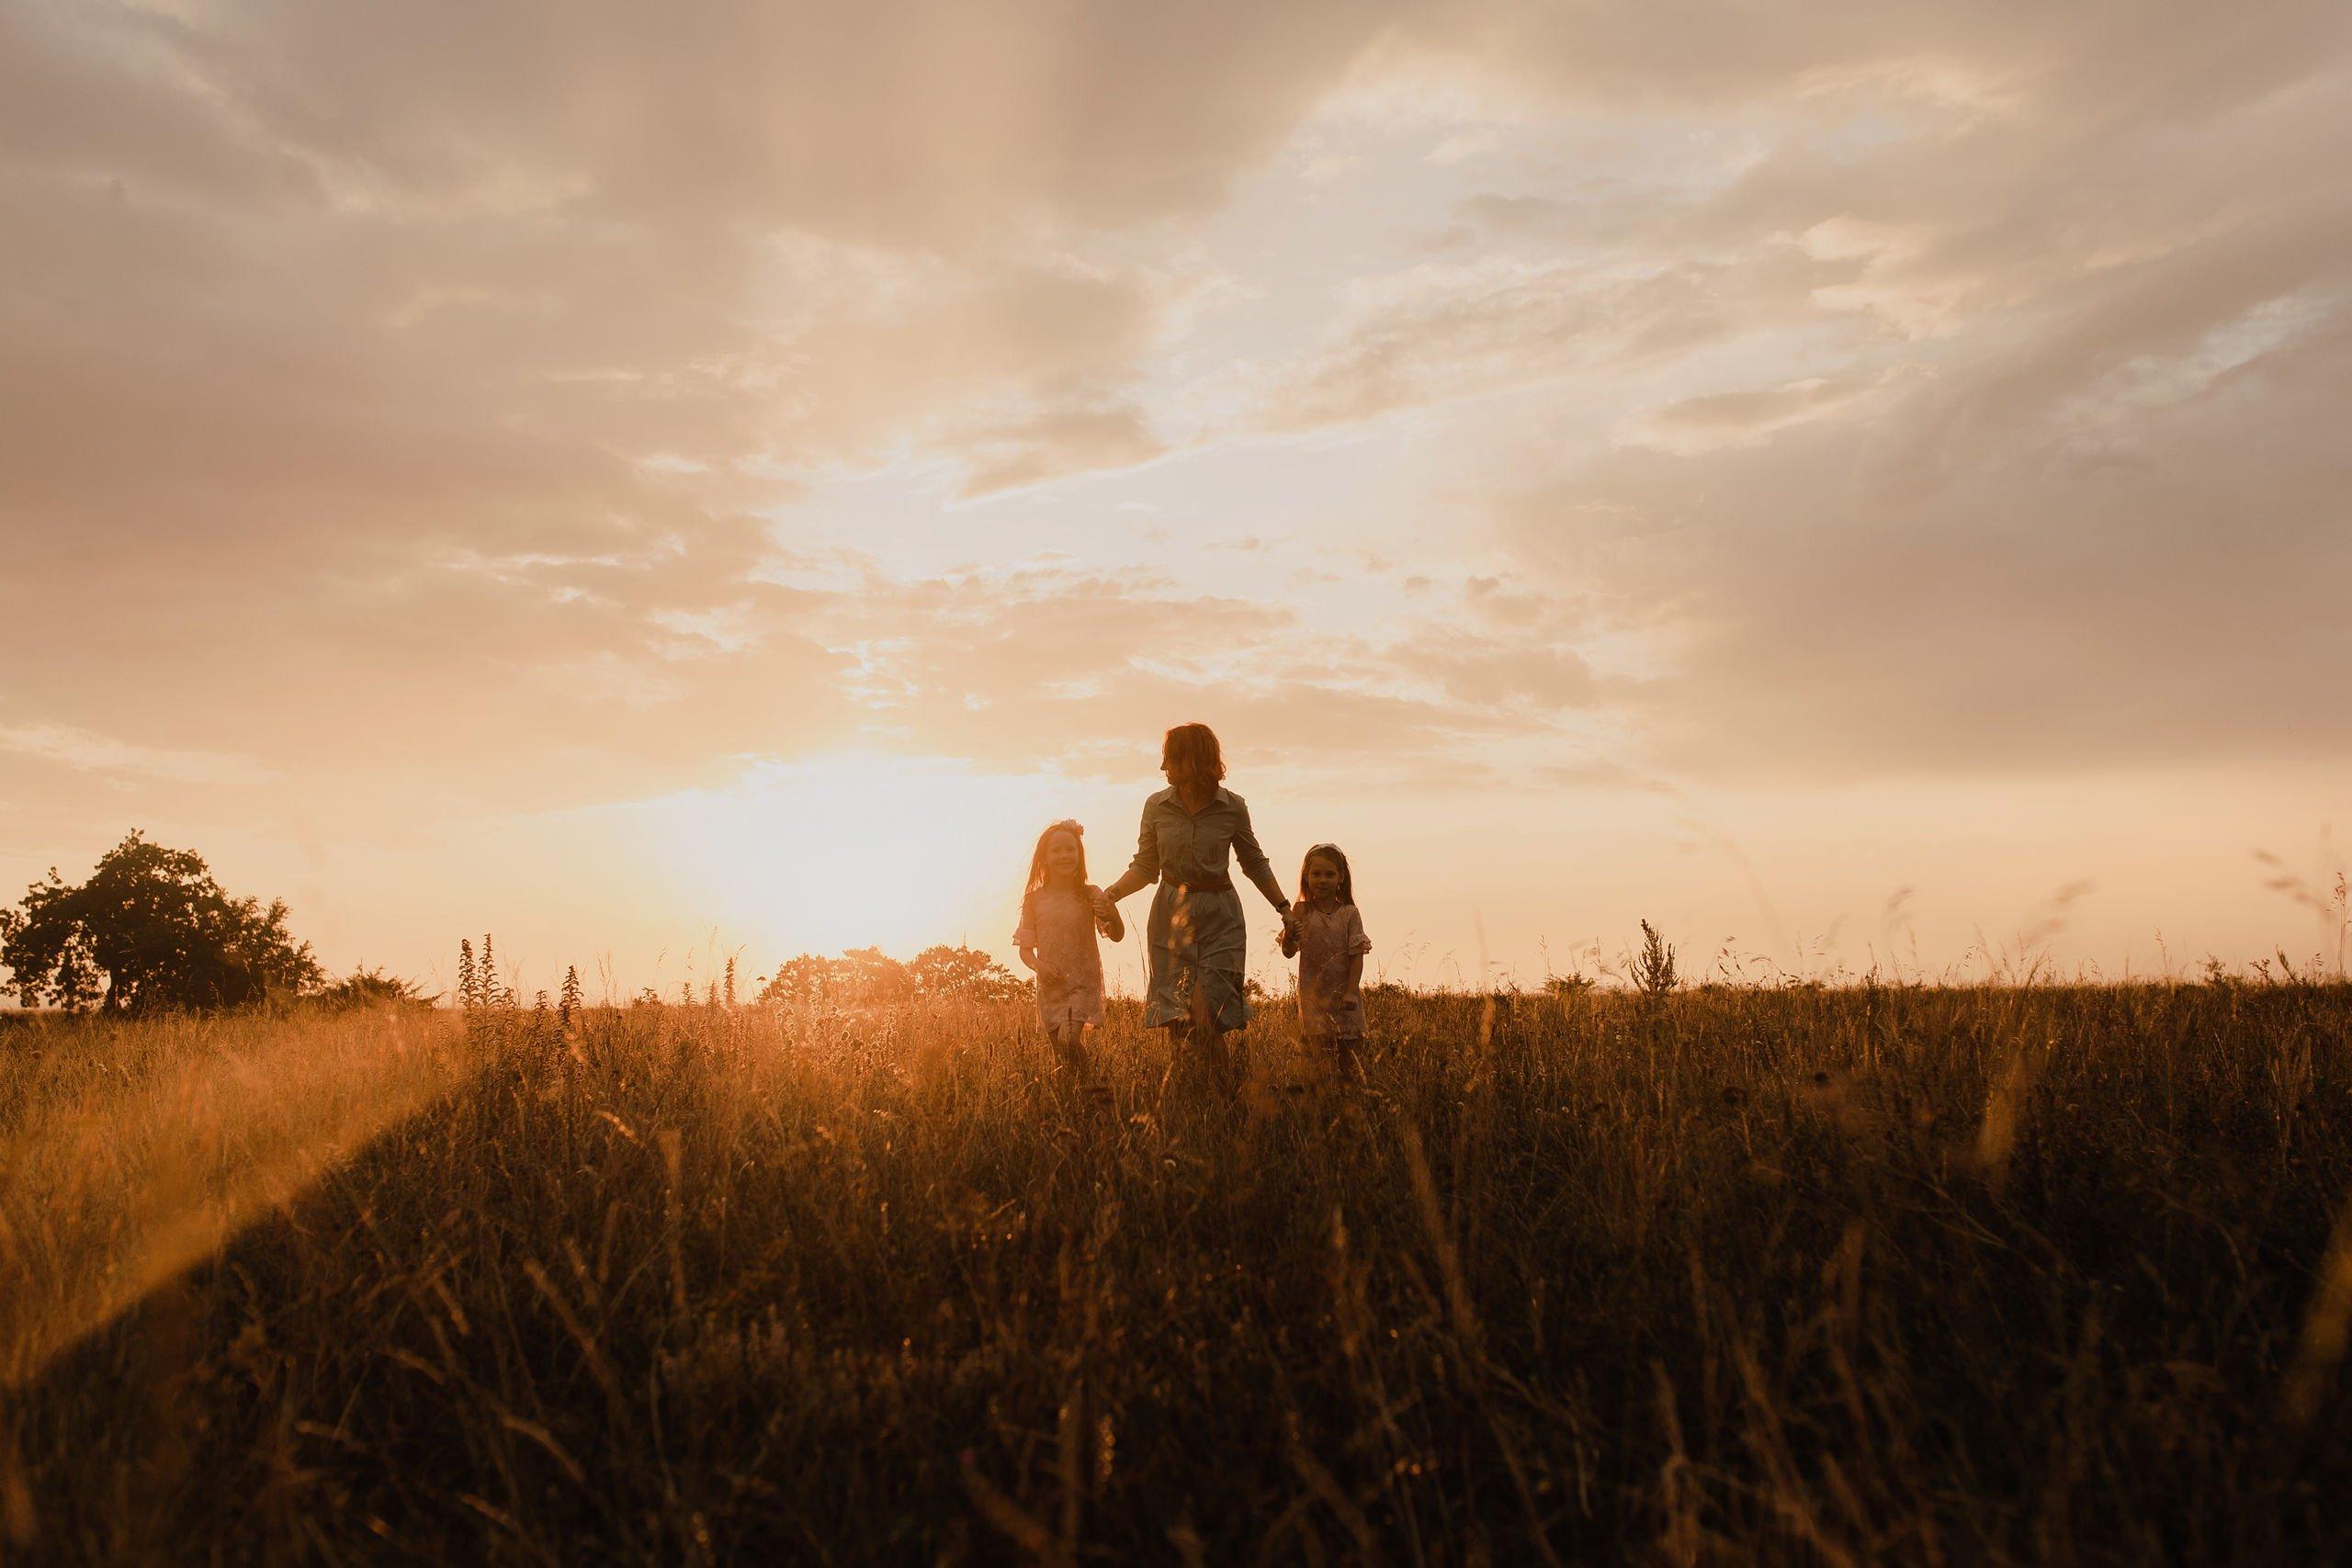 Беспутные поляны. Семейная прогулка